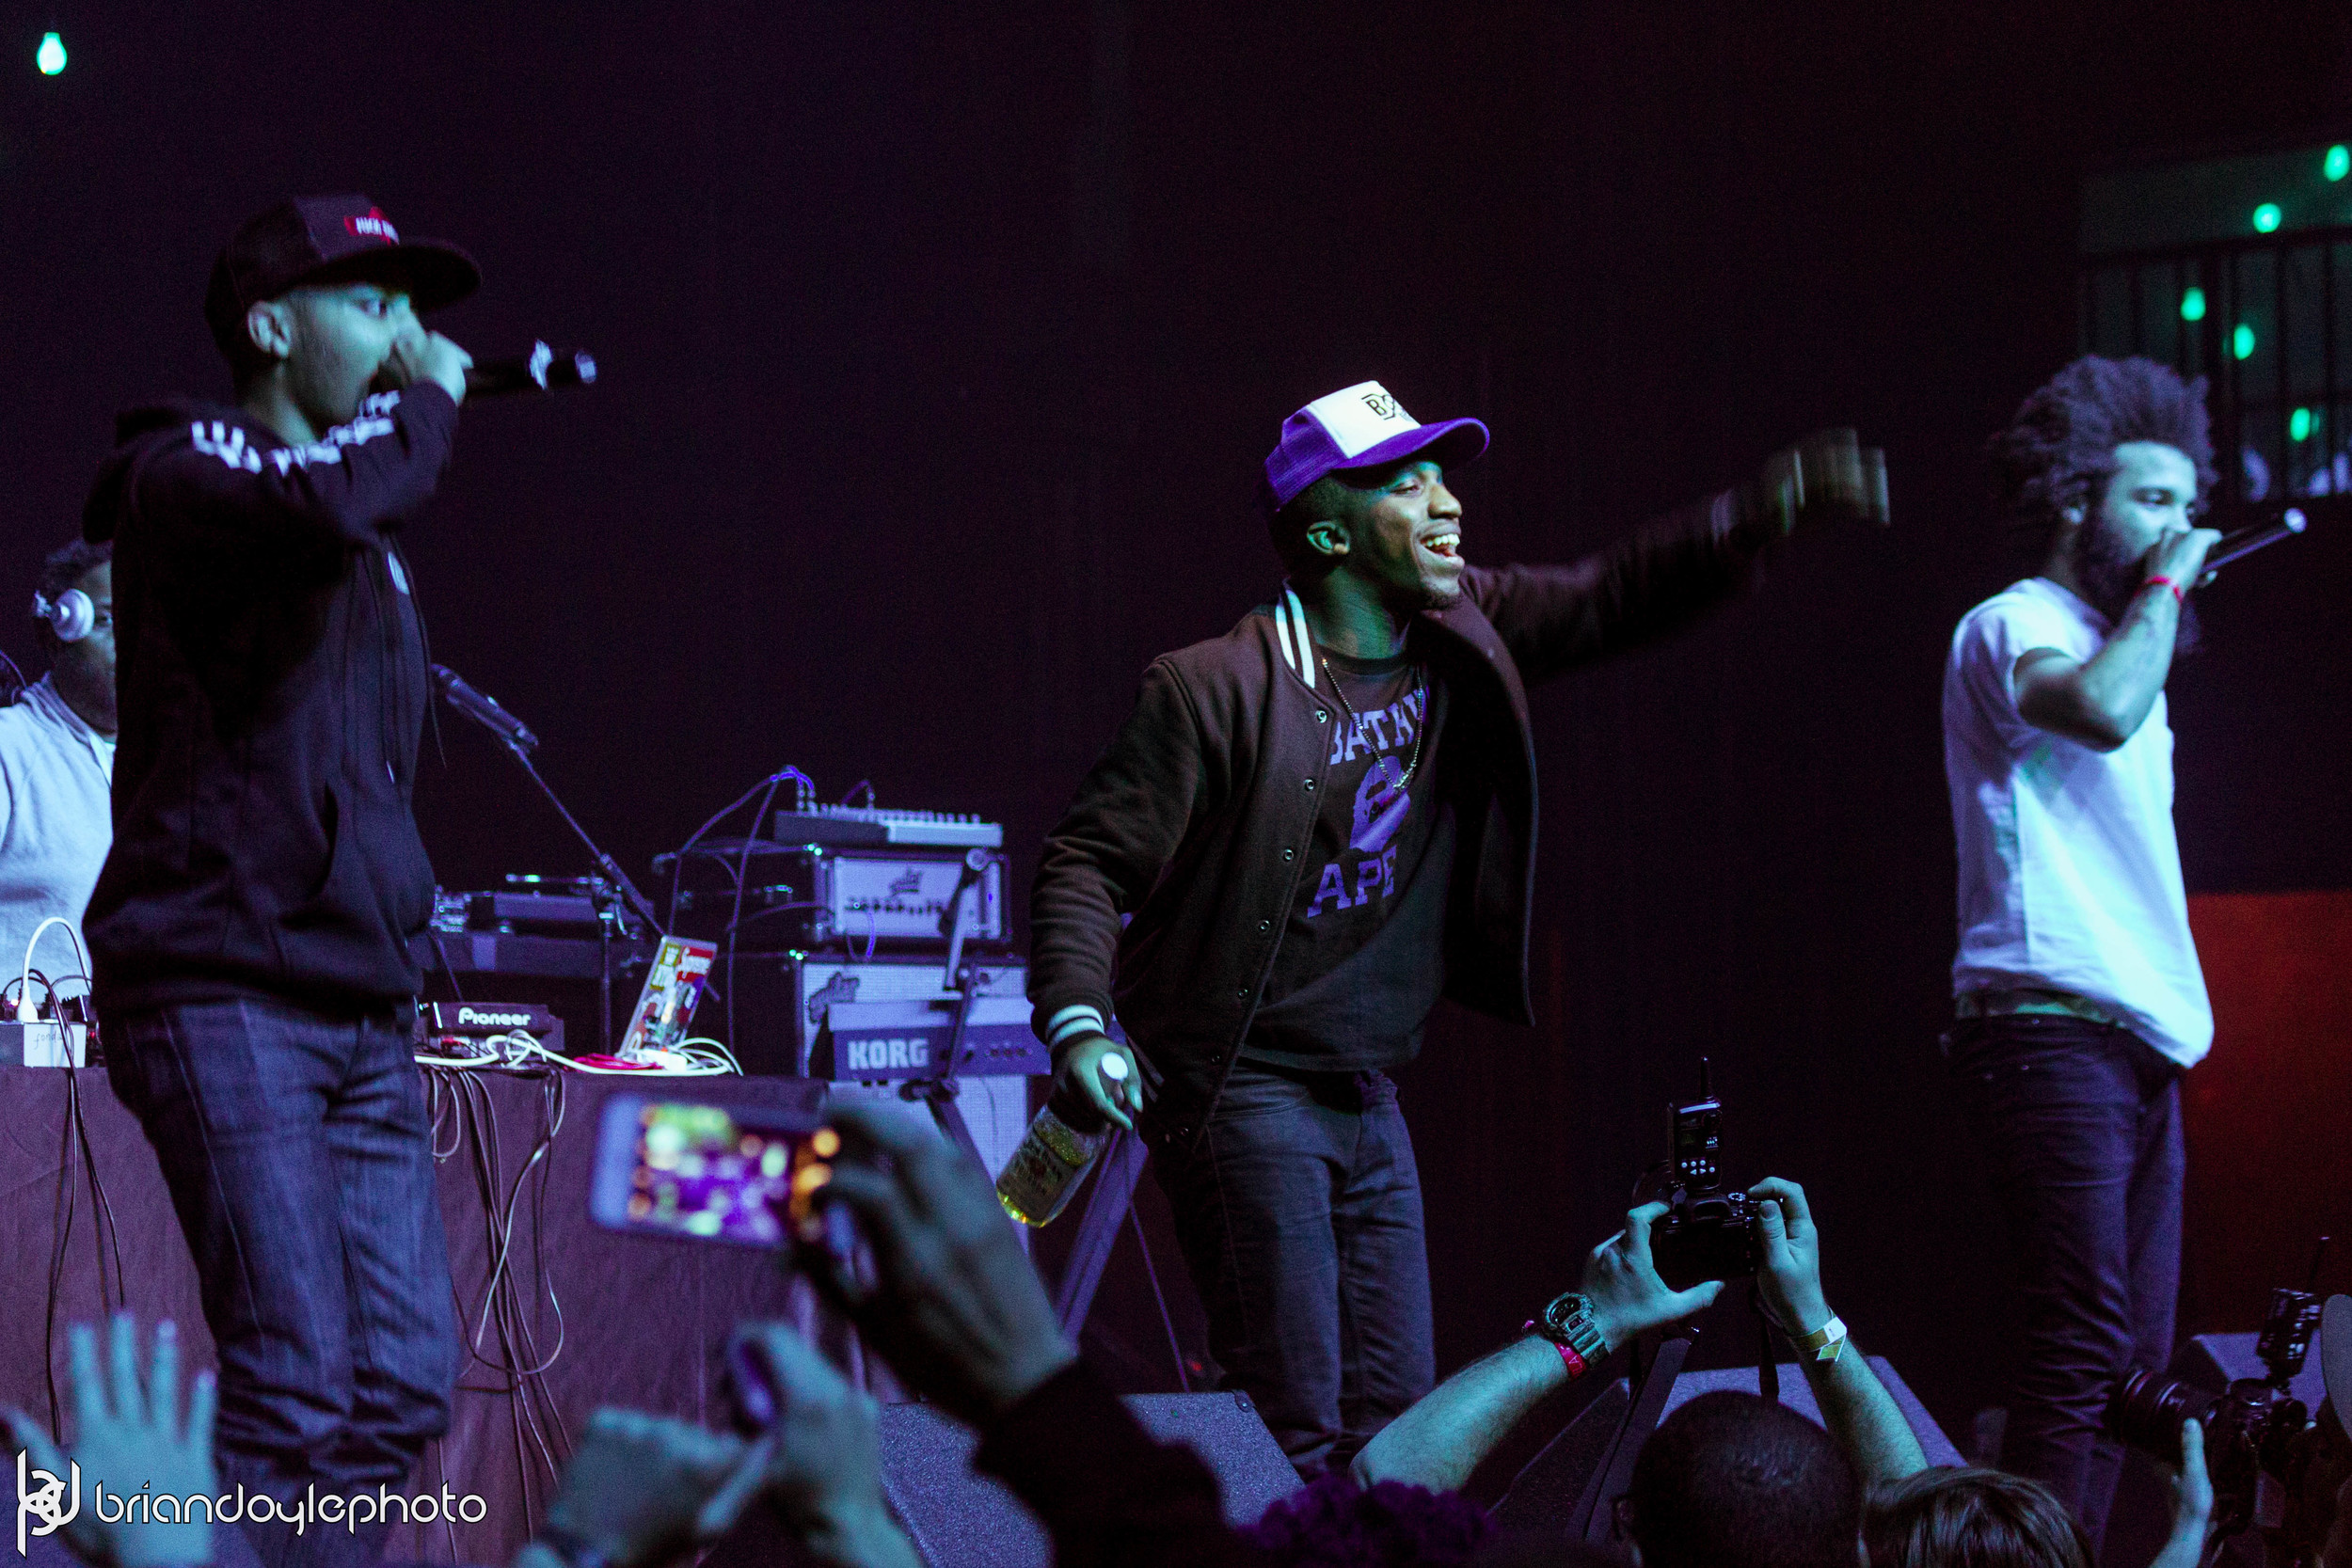 Lil Wayne, Juicy J, Two-9, Tree @ The Fonda 25.11.2014-21.jpg